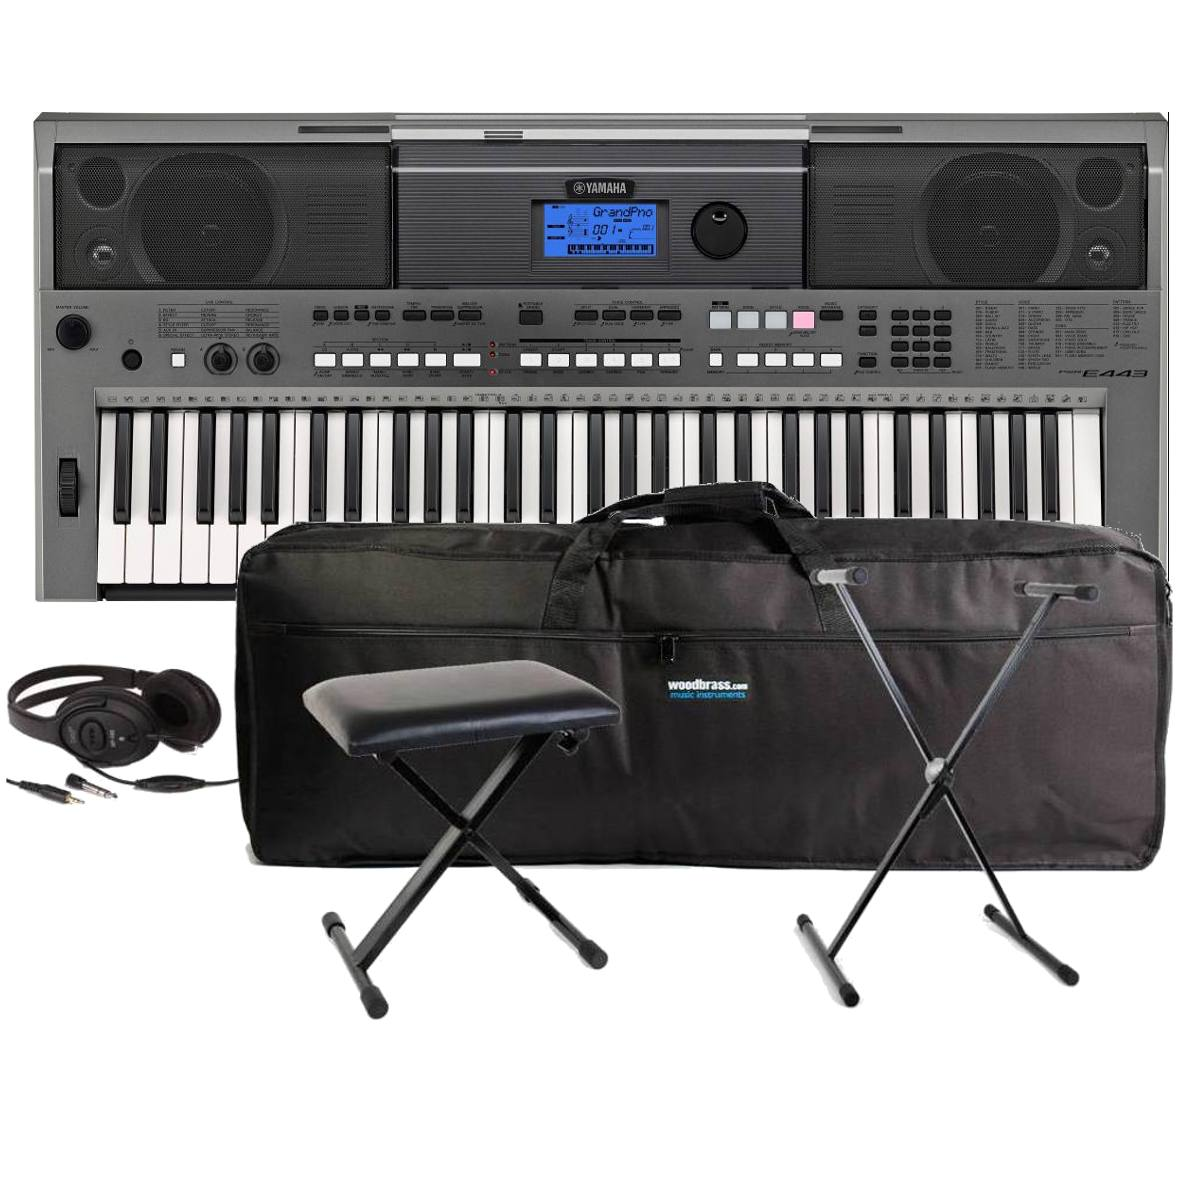 Yamaha synthetiseur clavier claviers arrangeurs for Yamaha ypg 535 vs dgx 650